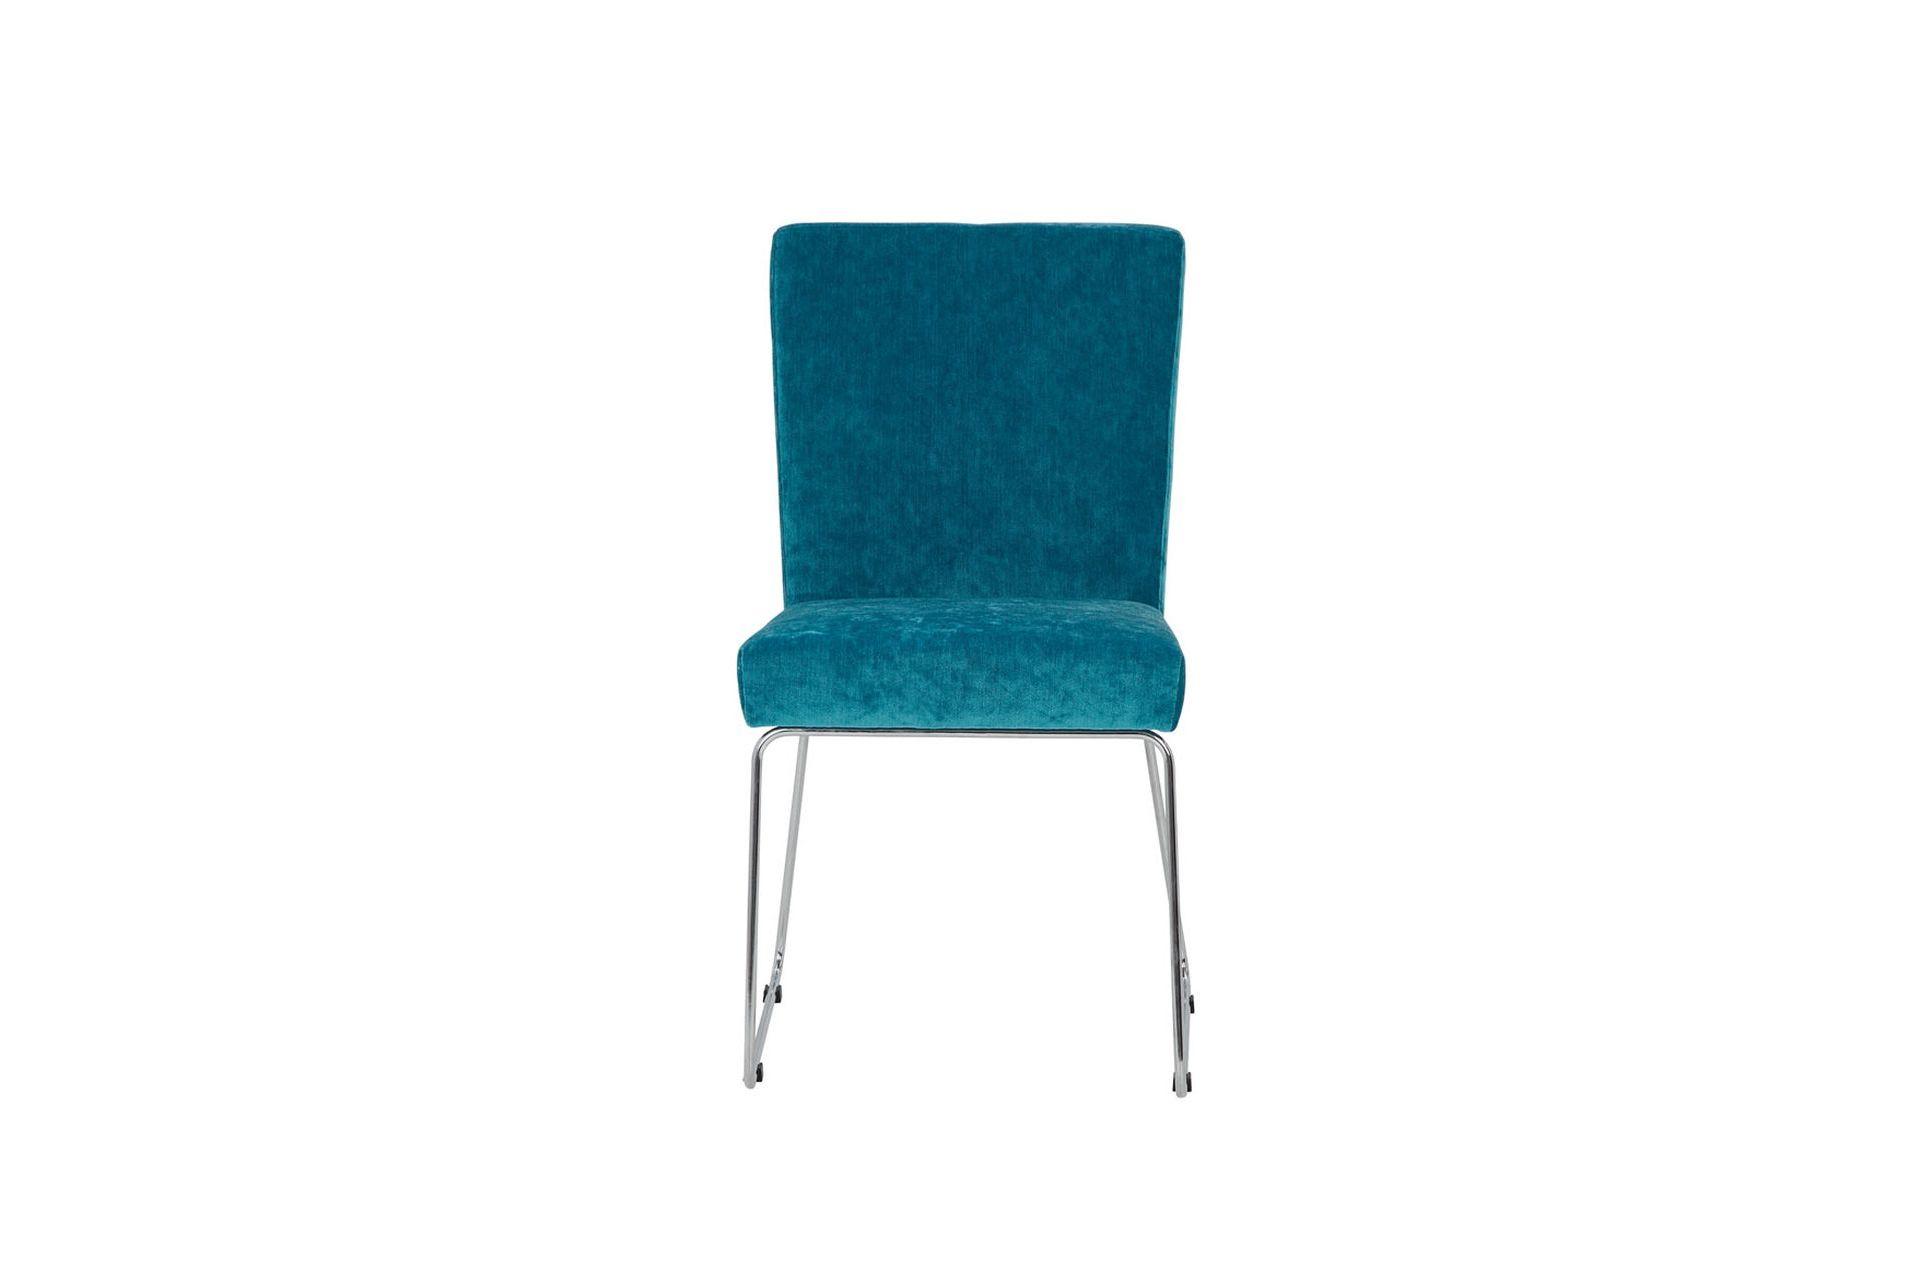 Кухонный стул Sits 15448927 от thefurnish